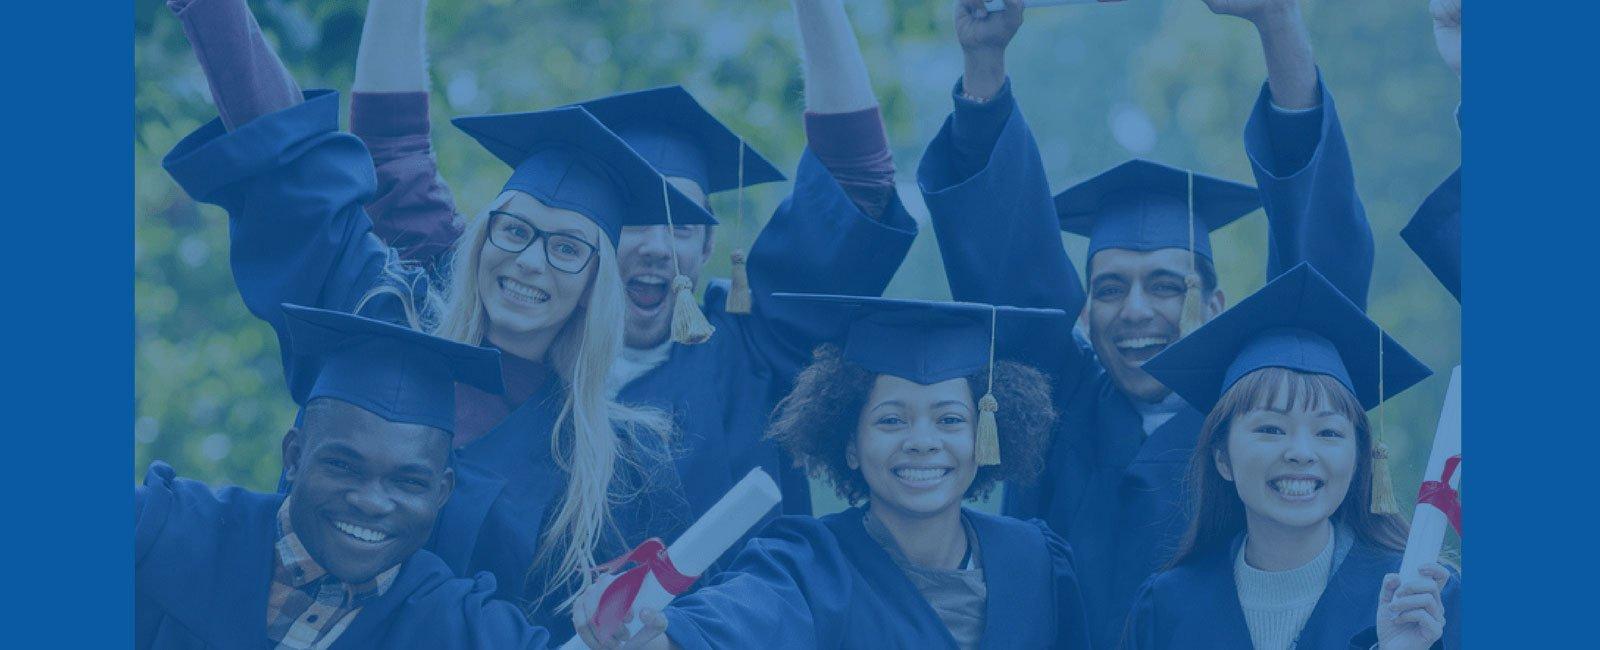 Choosing-the-Best-PhD-Program---Background-Image-1600